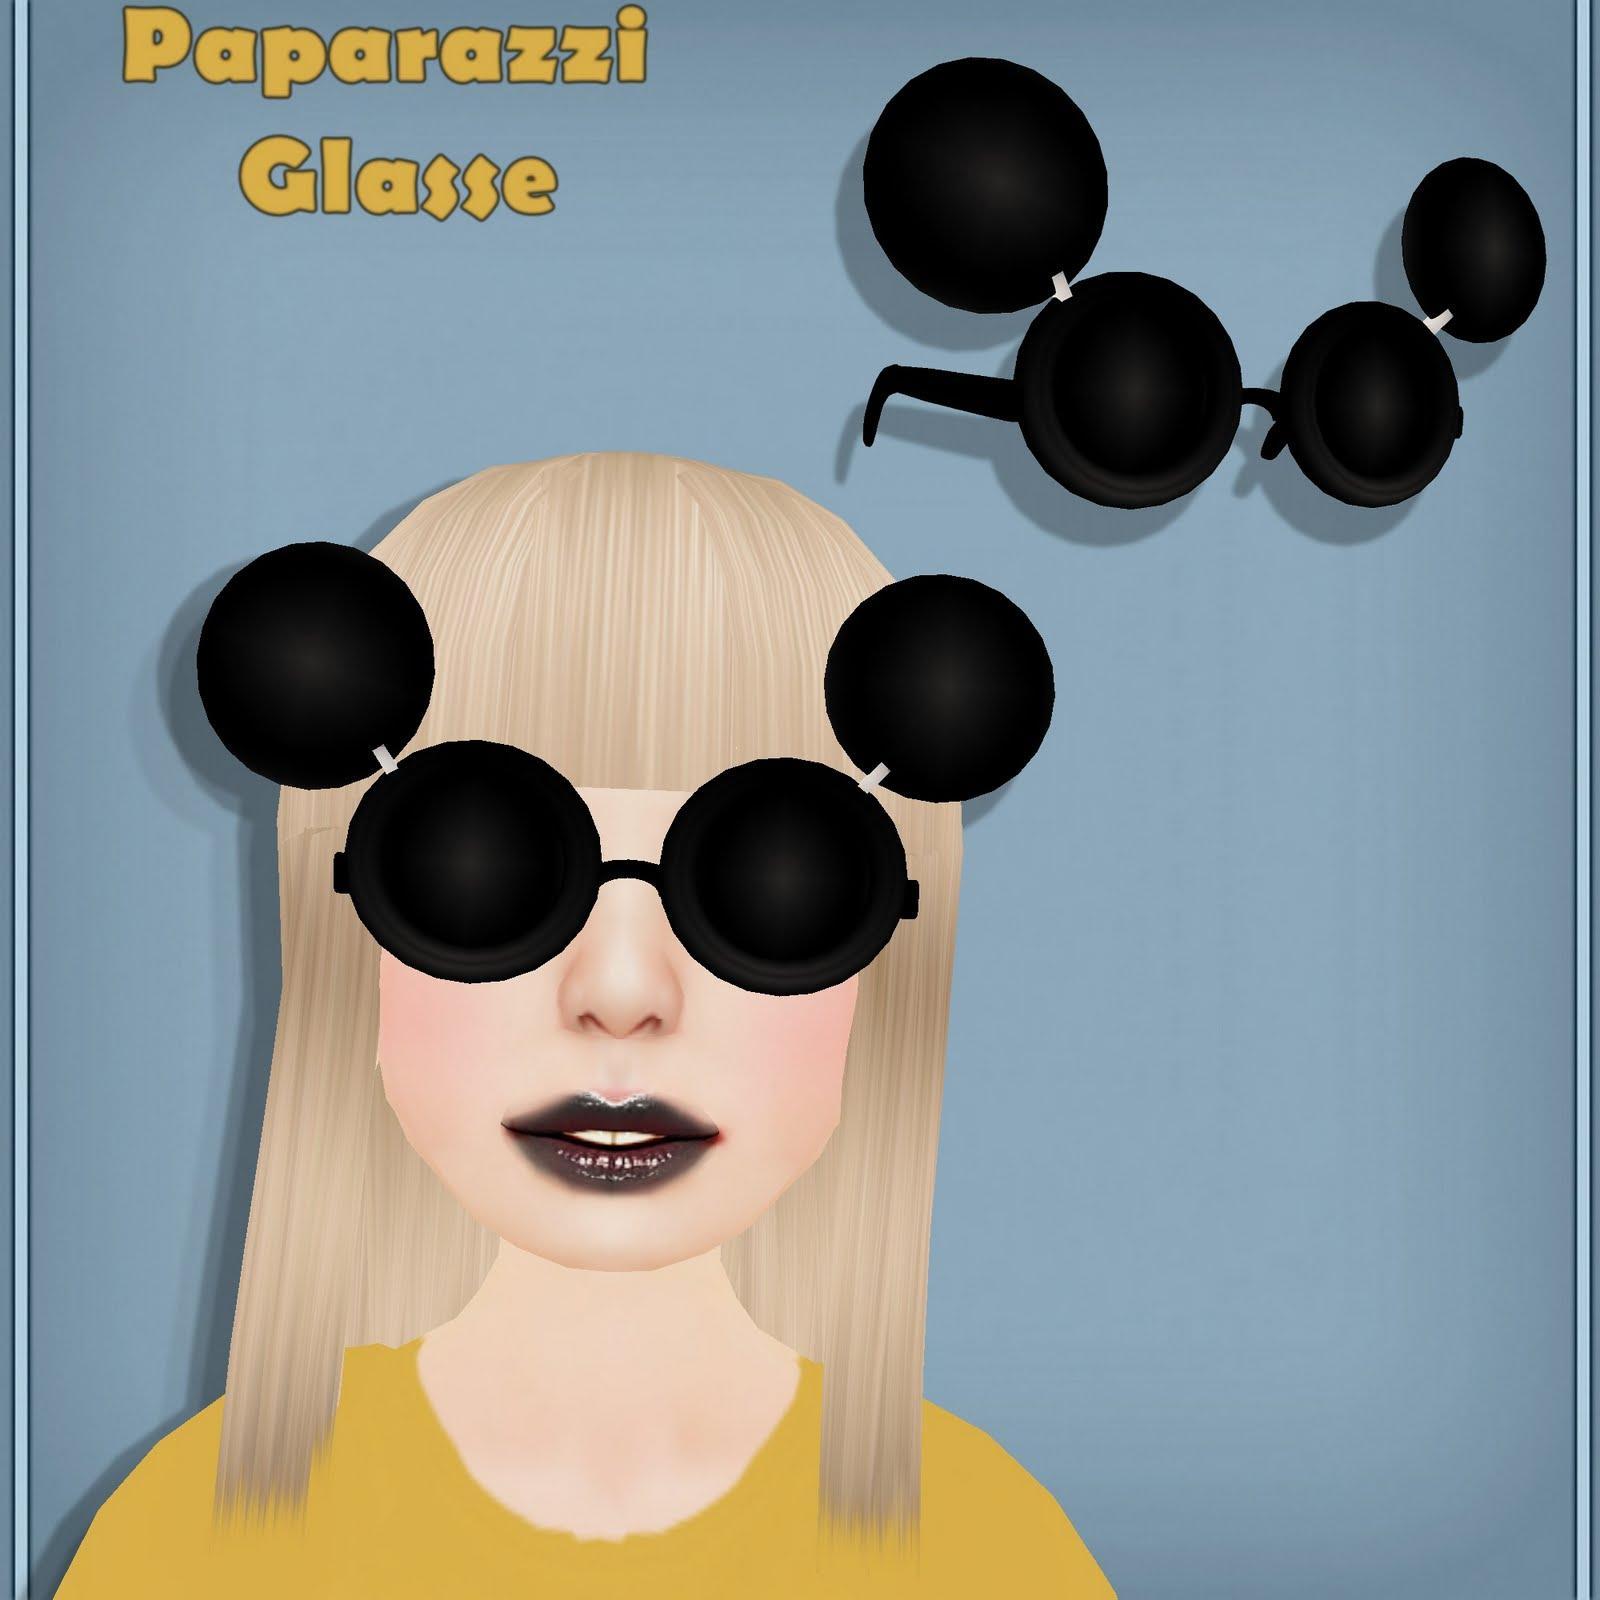 Lady Gaga Glasses - Paparazzi